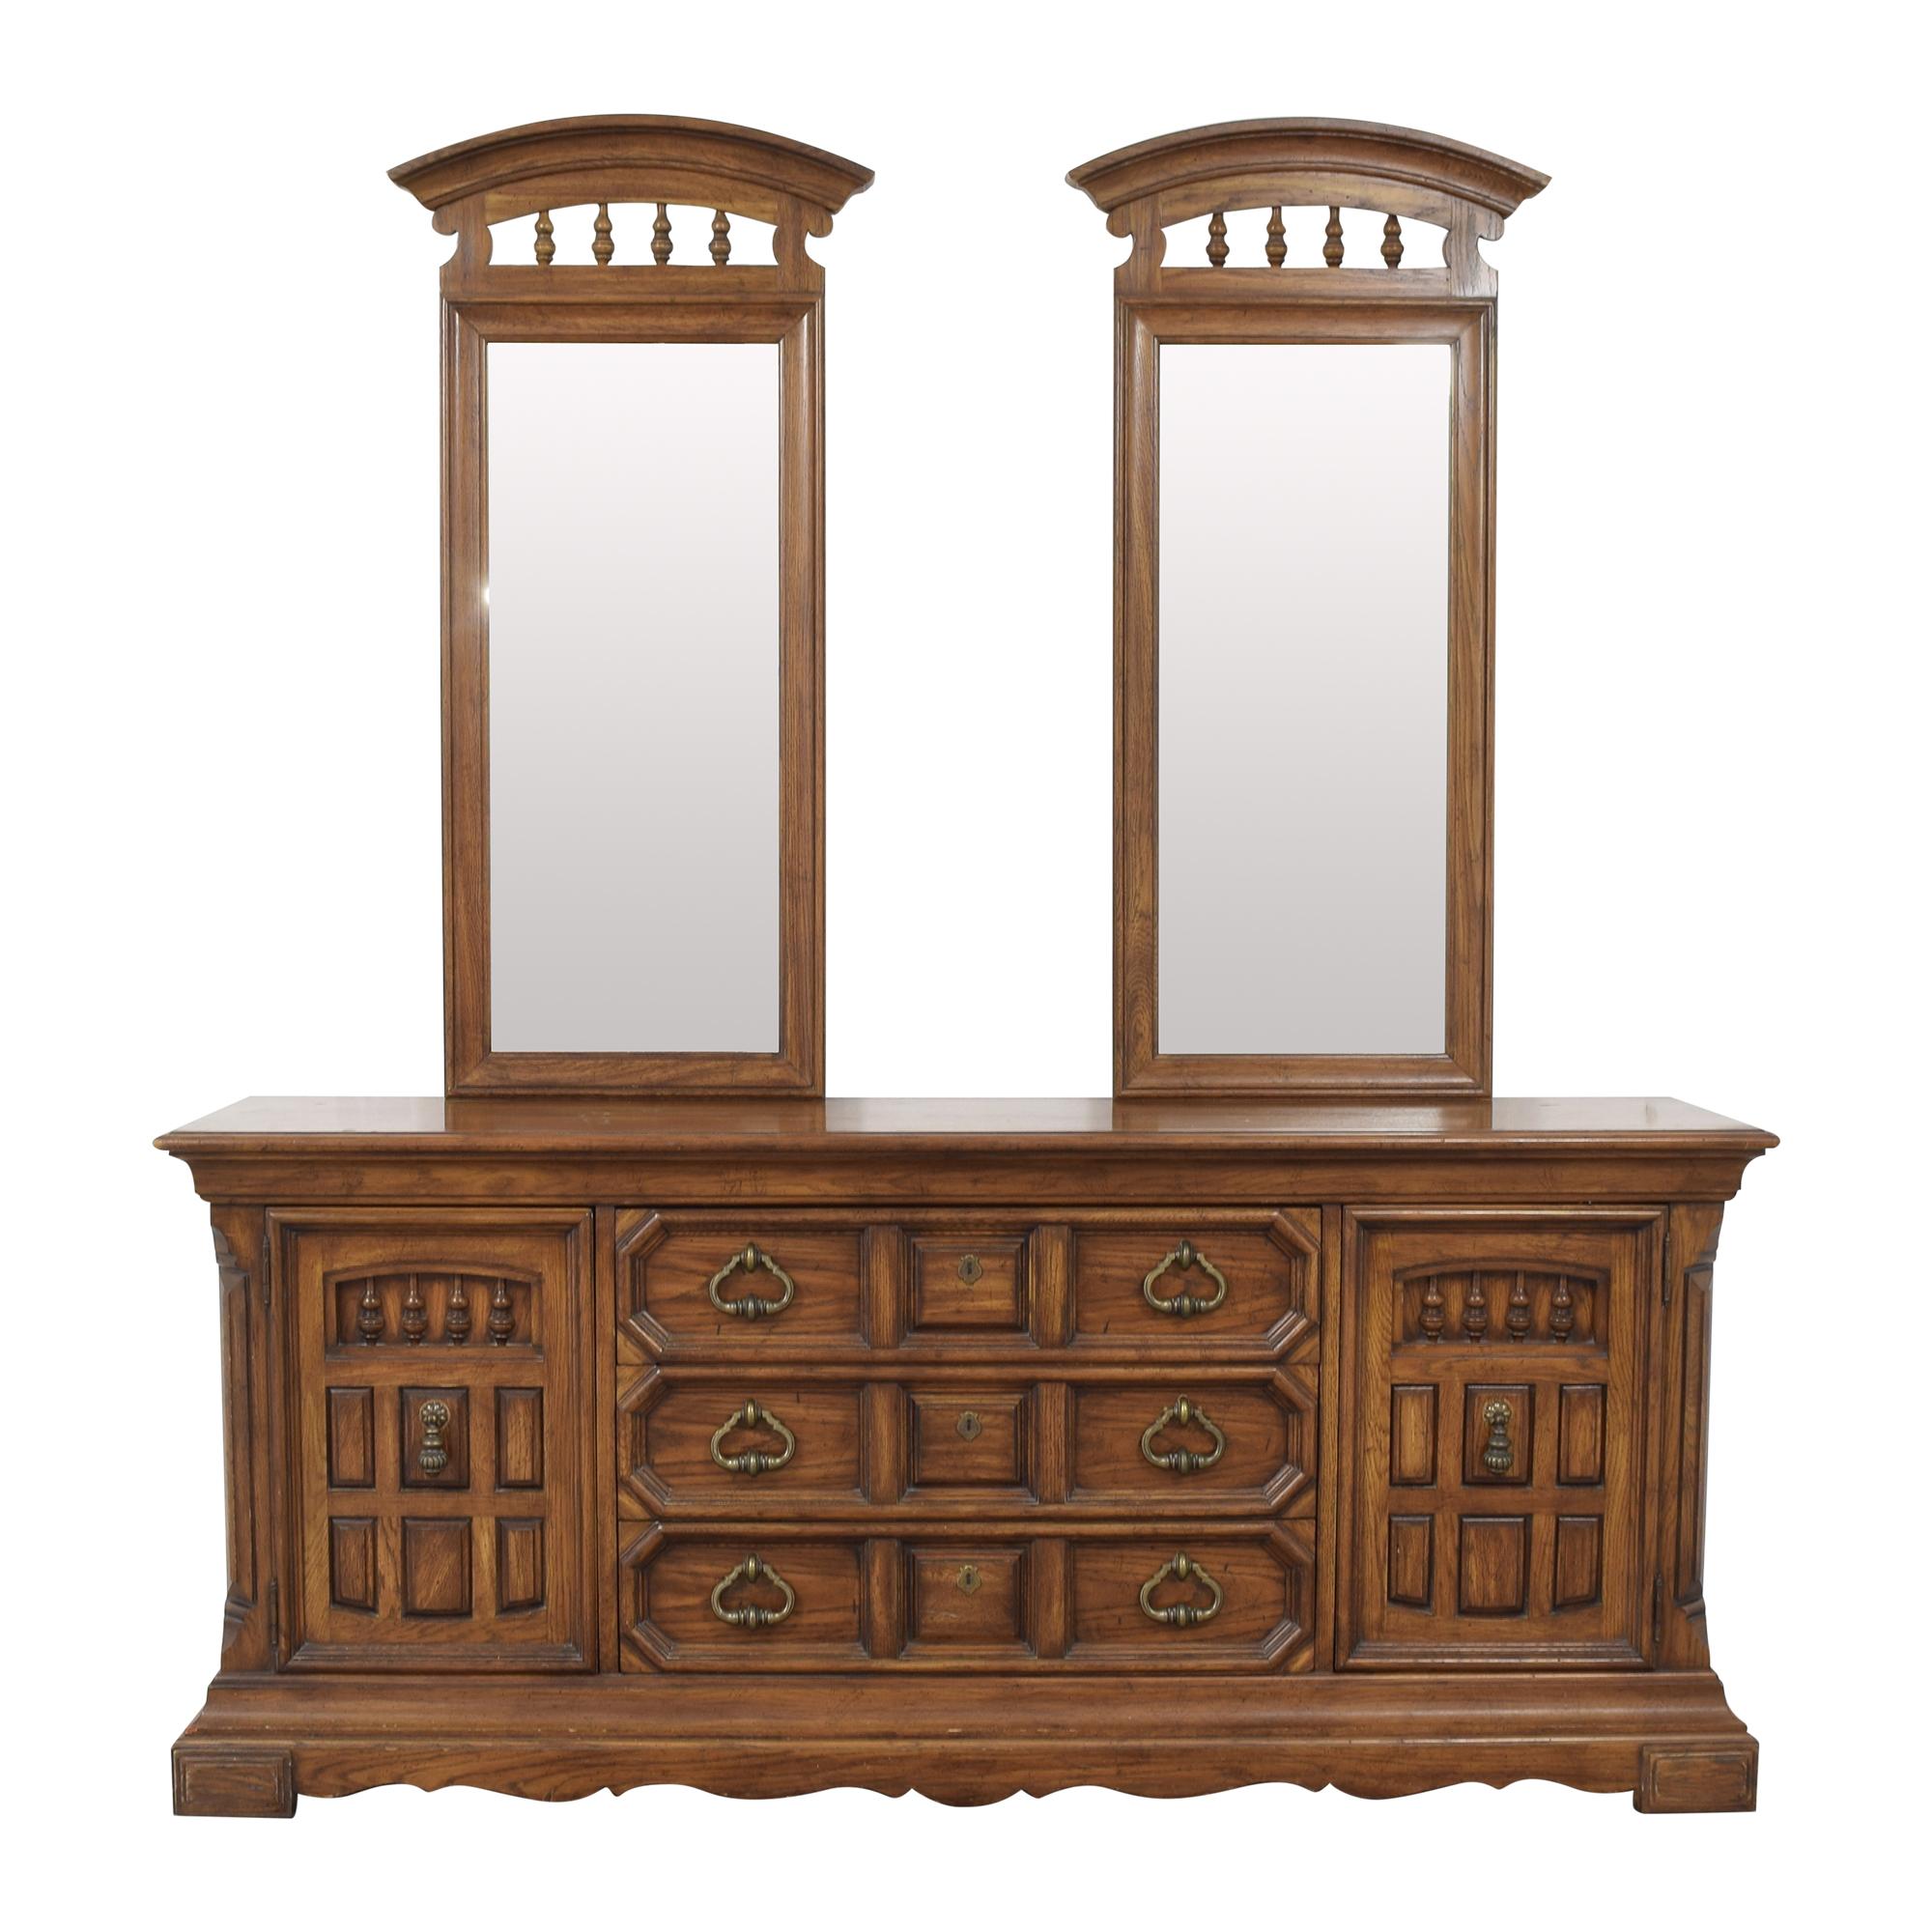 Thomasville Thomasville Triple Dresser with Mirrors on sale